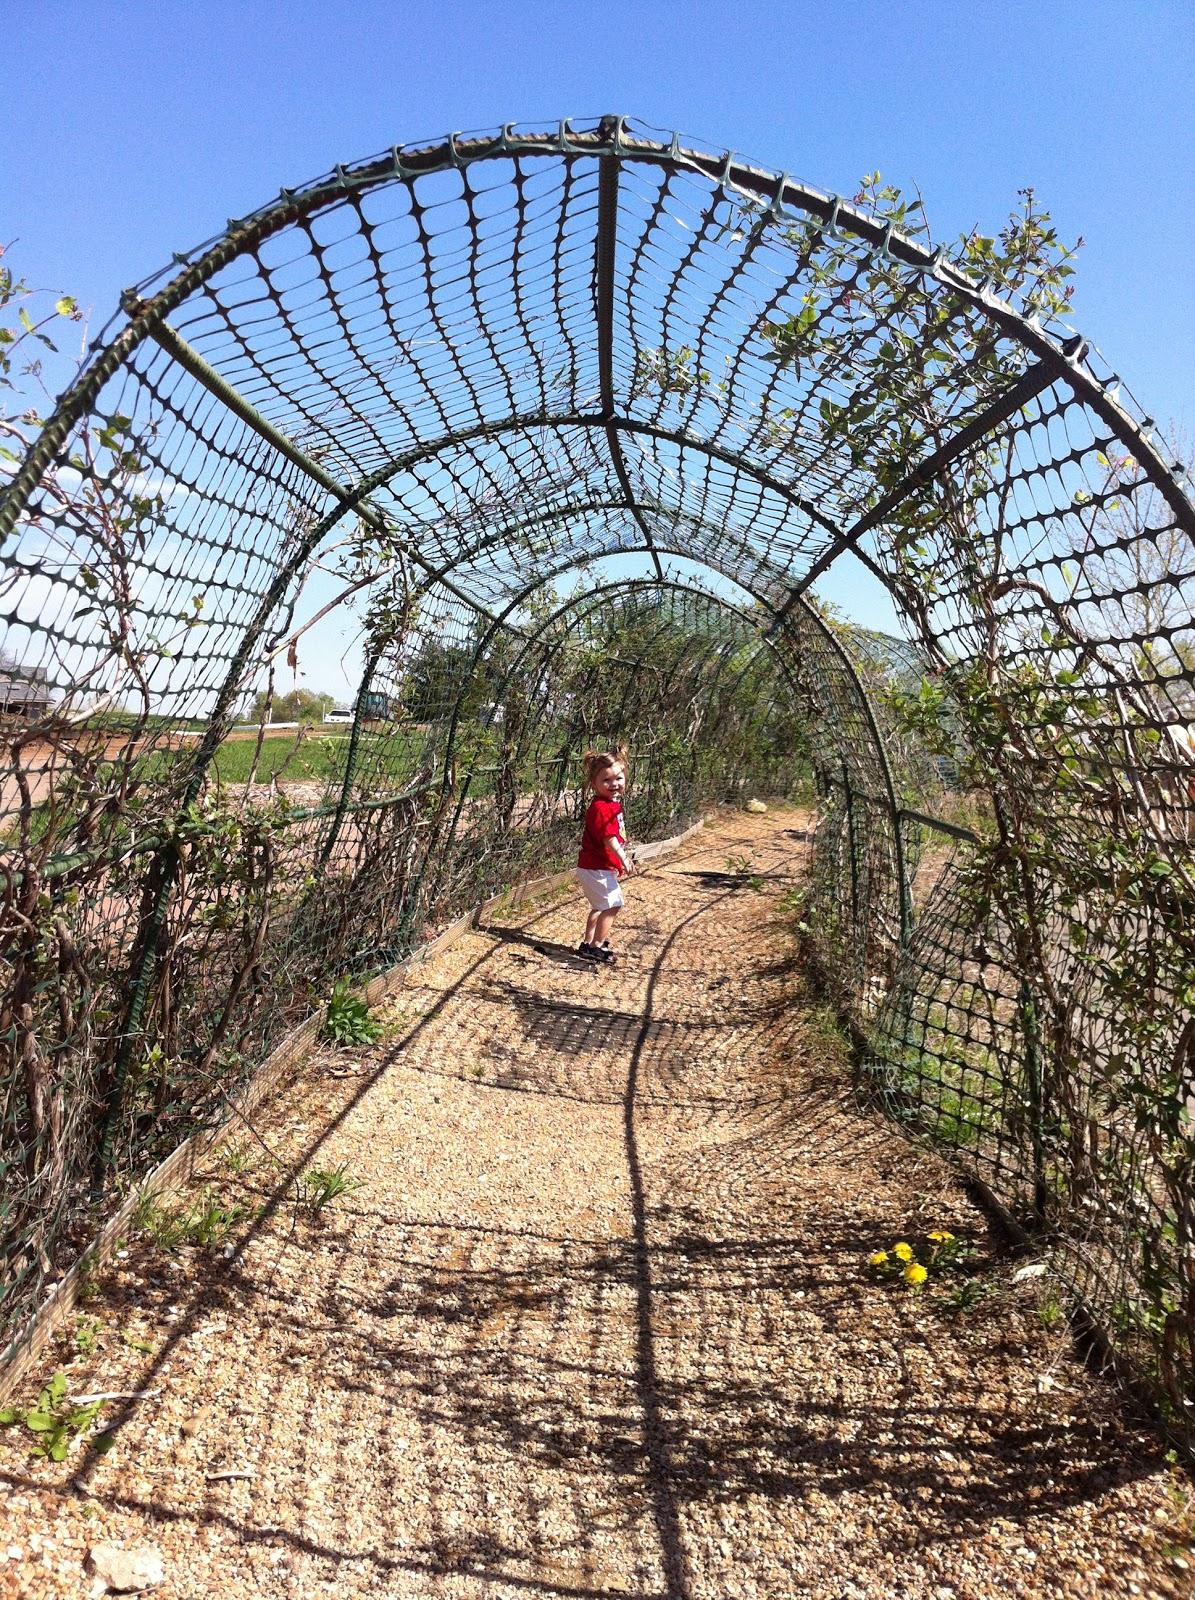 The Brighter Writer: The Overland Park Arboretum and Botanical Gardens